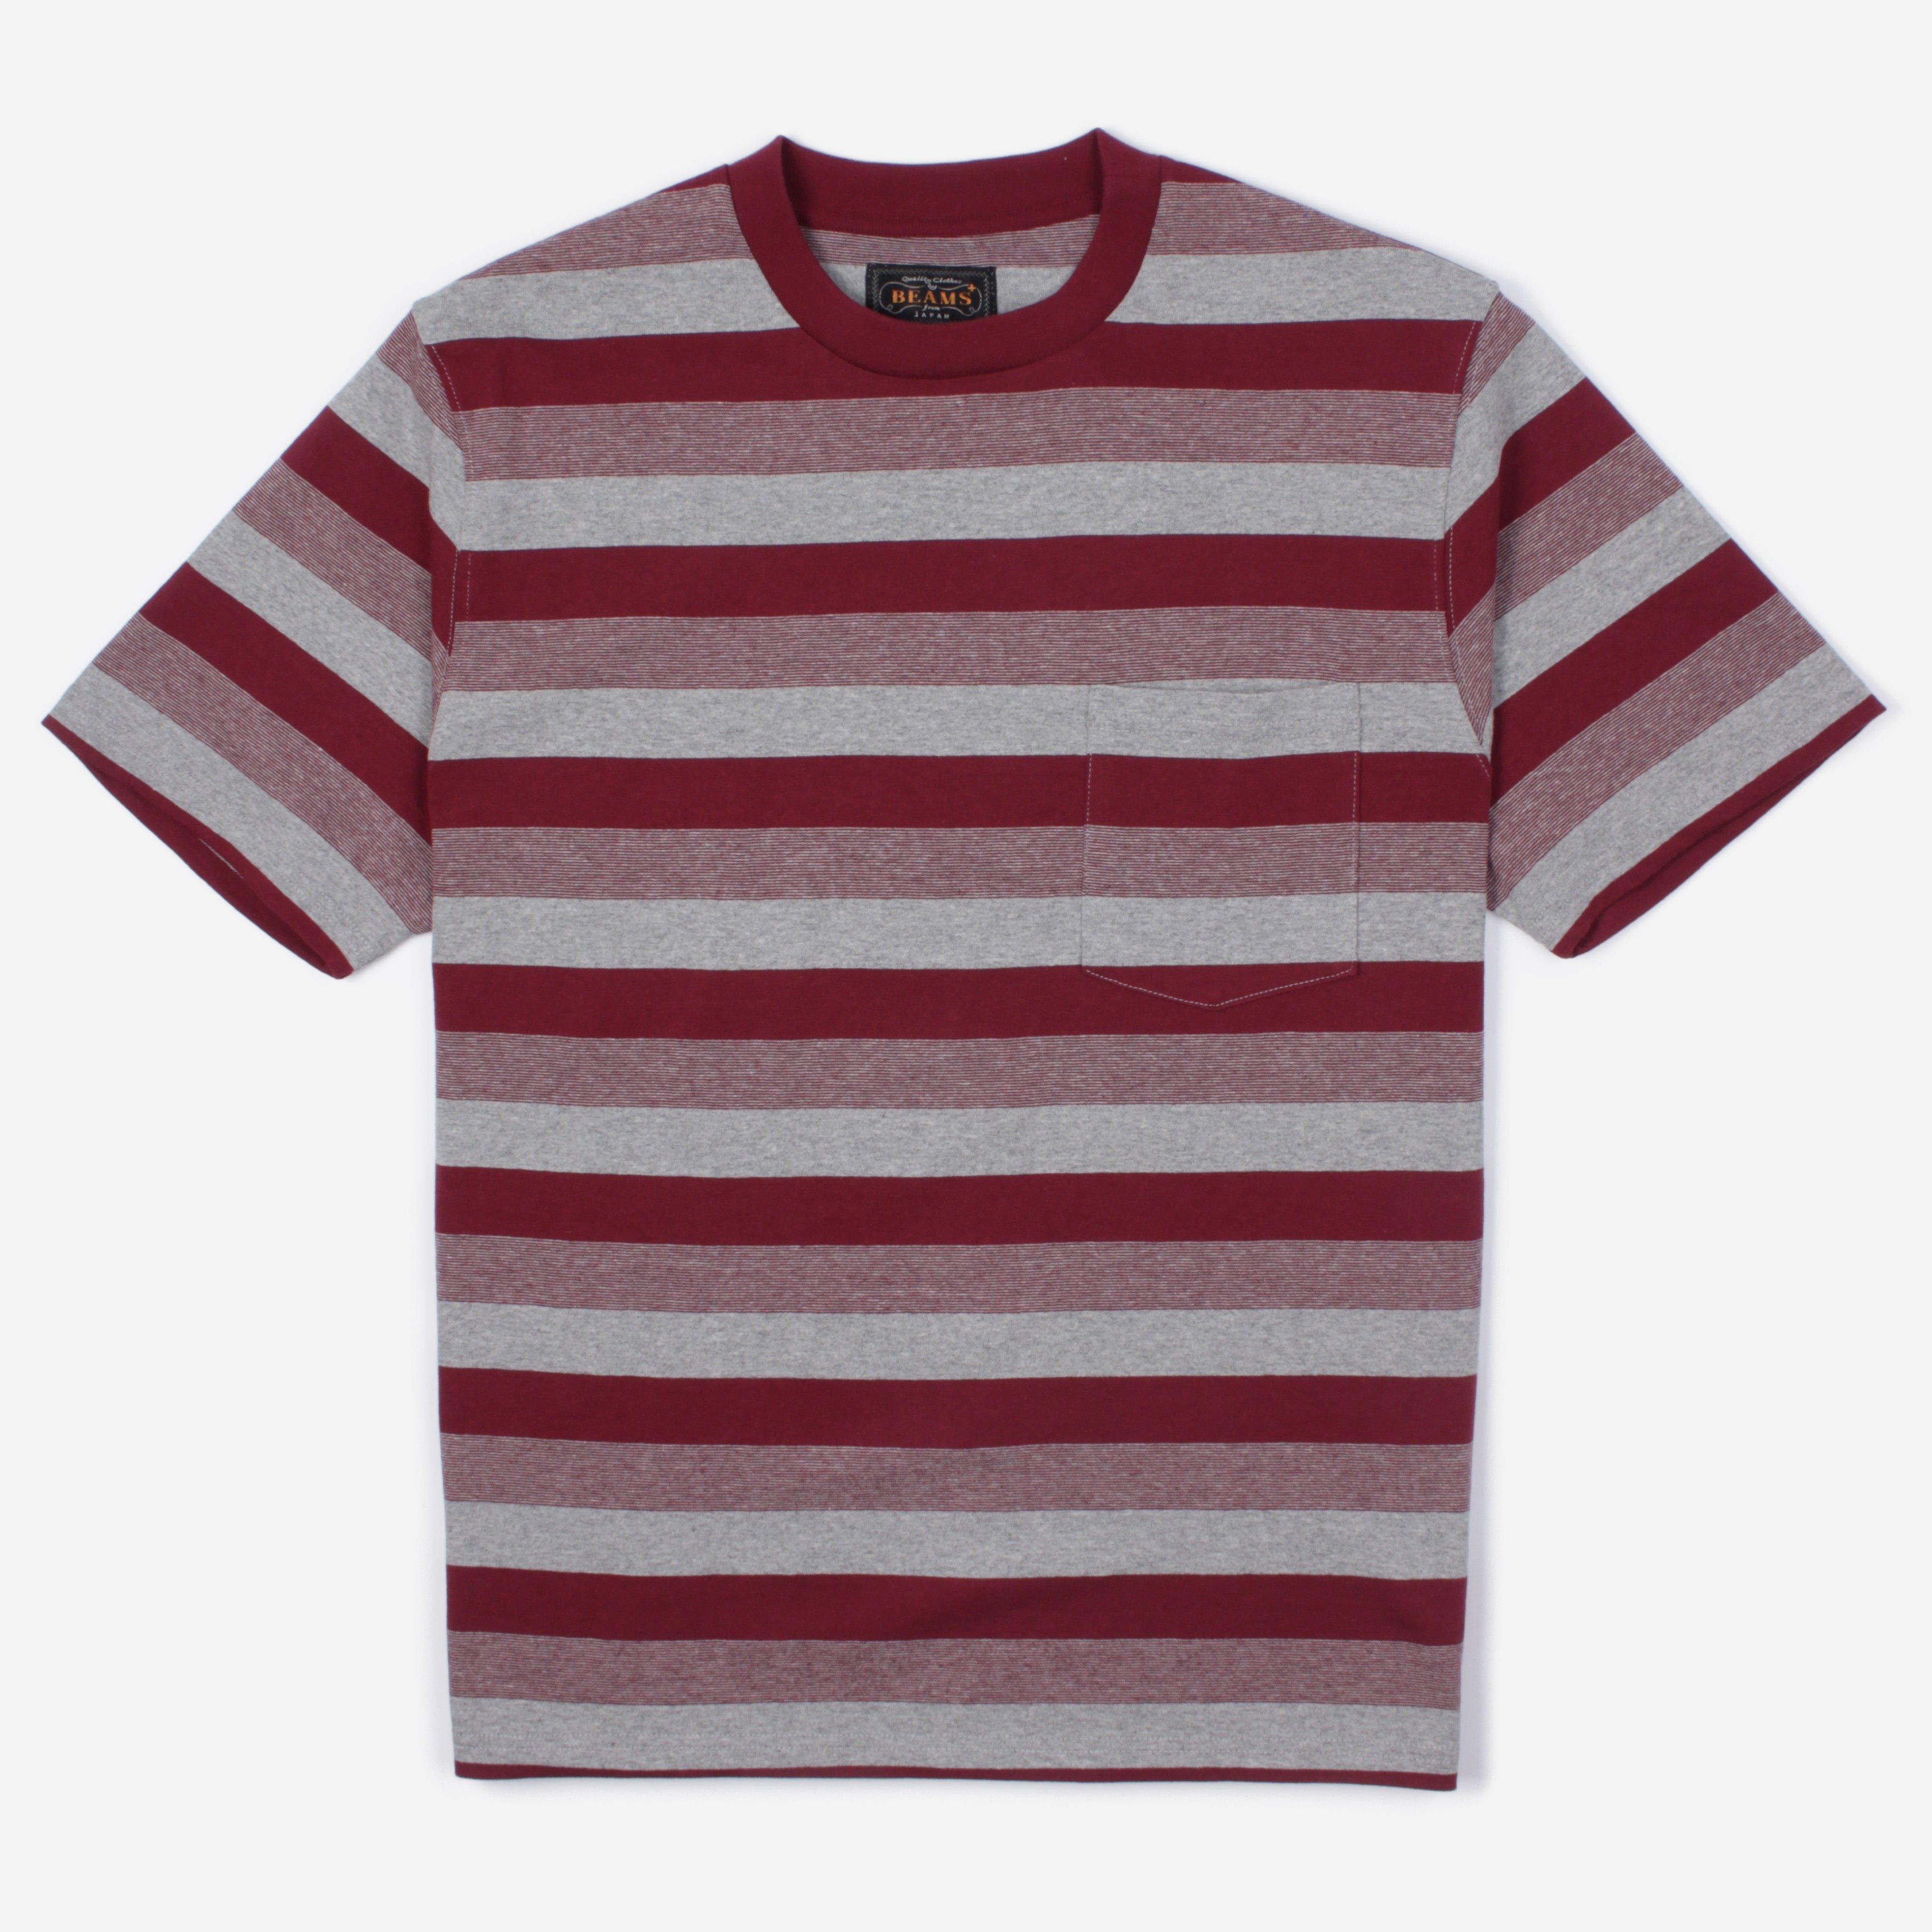 Lyst - Beams Plus Graduation Border Stripe Pocket T-shirt ...Red Graduation Borders